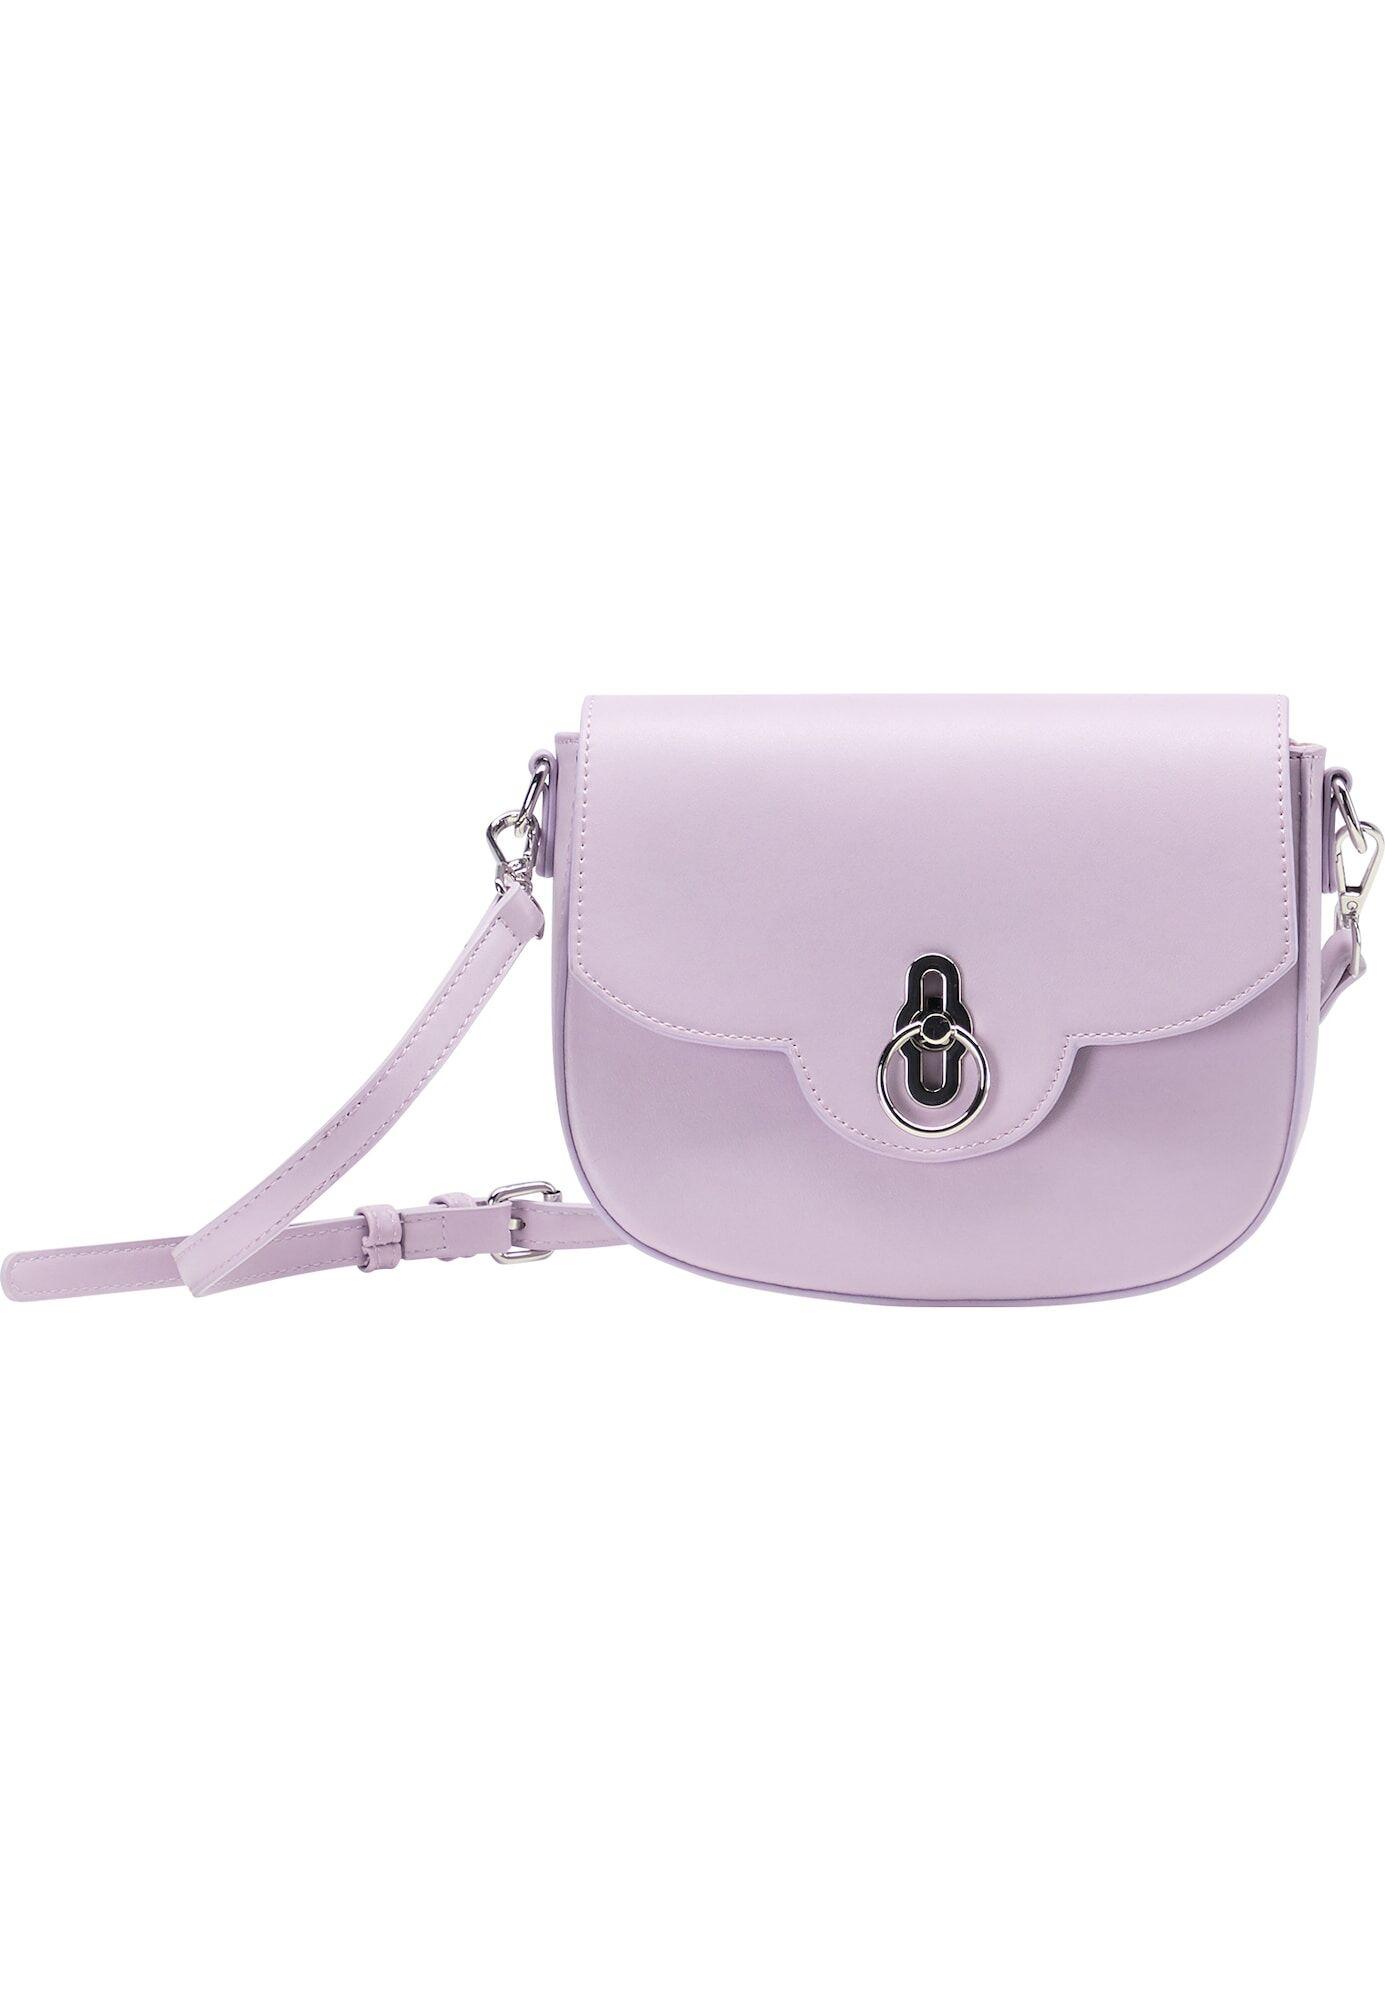 MYMO Sac à bandoulière  - Violet - Taille: One Size - female